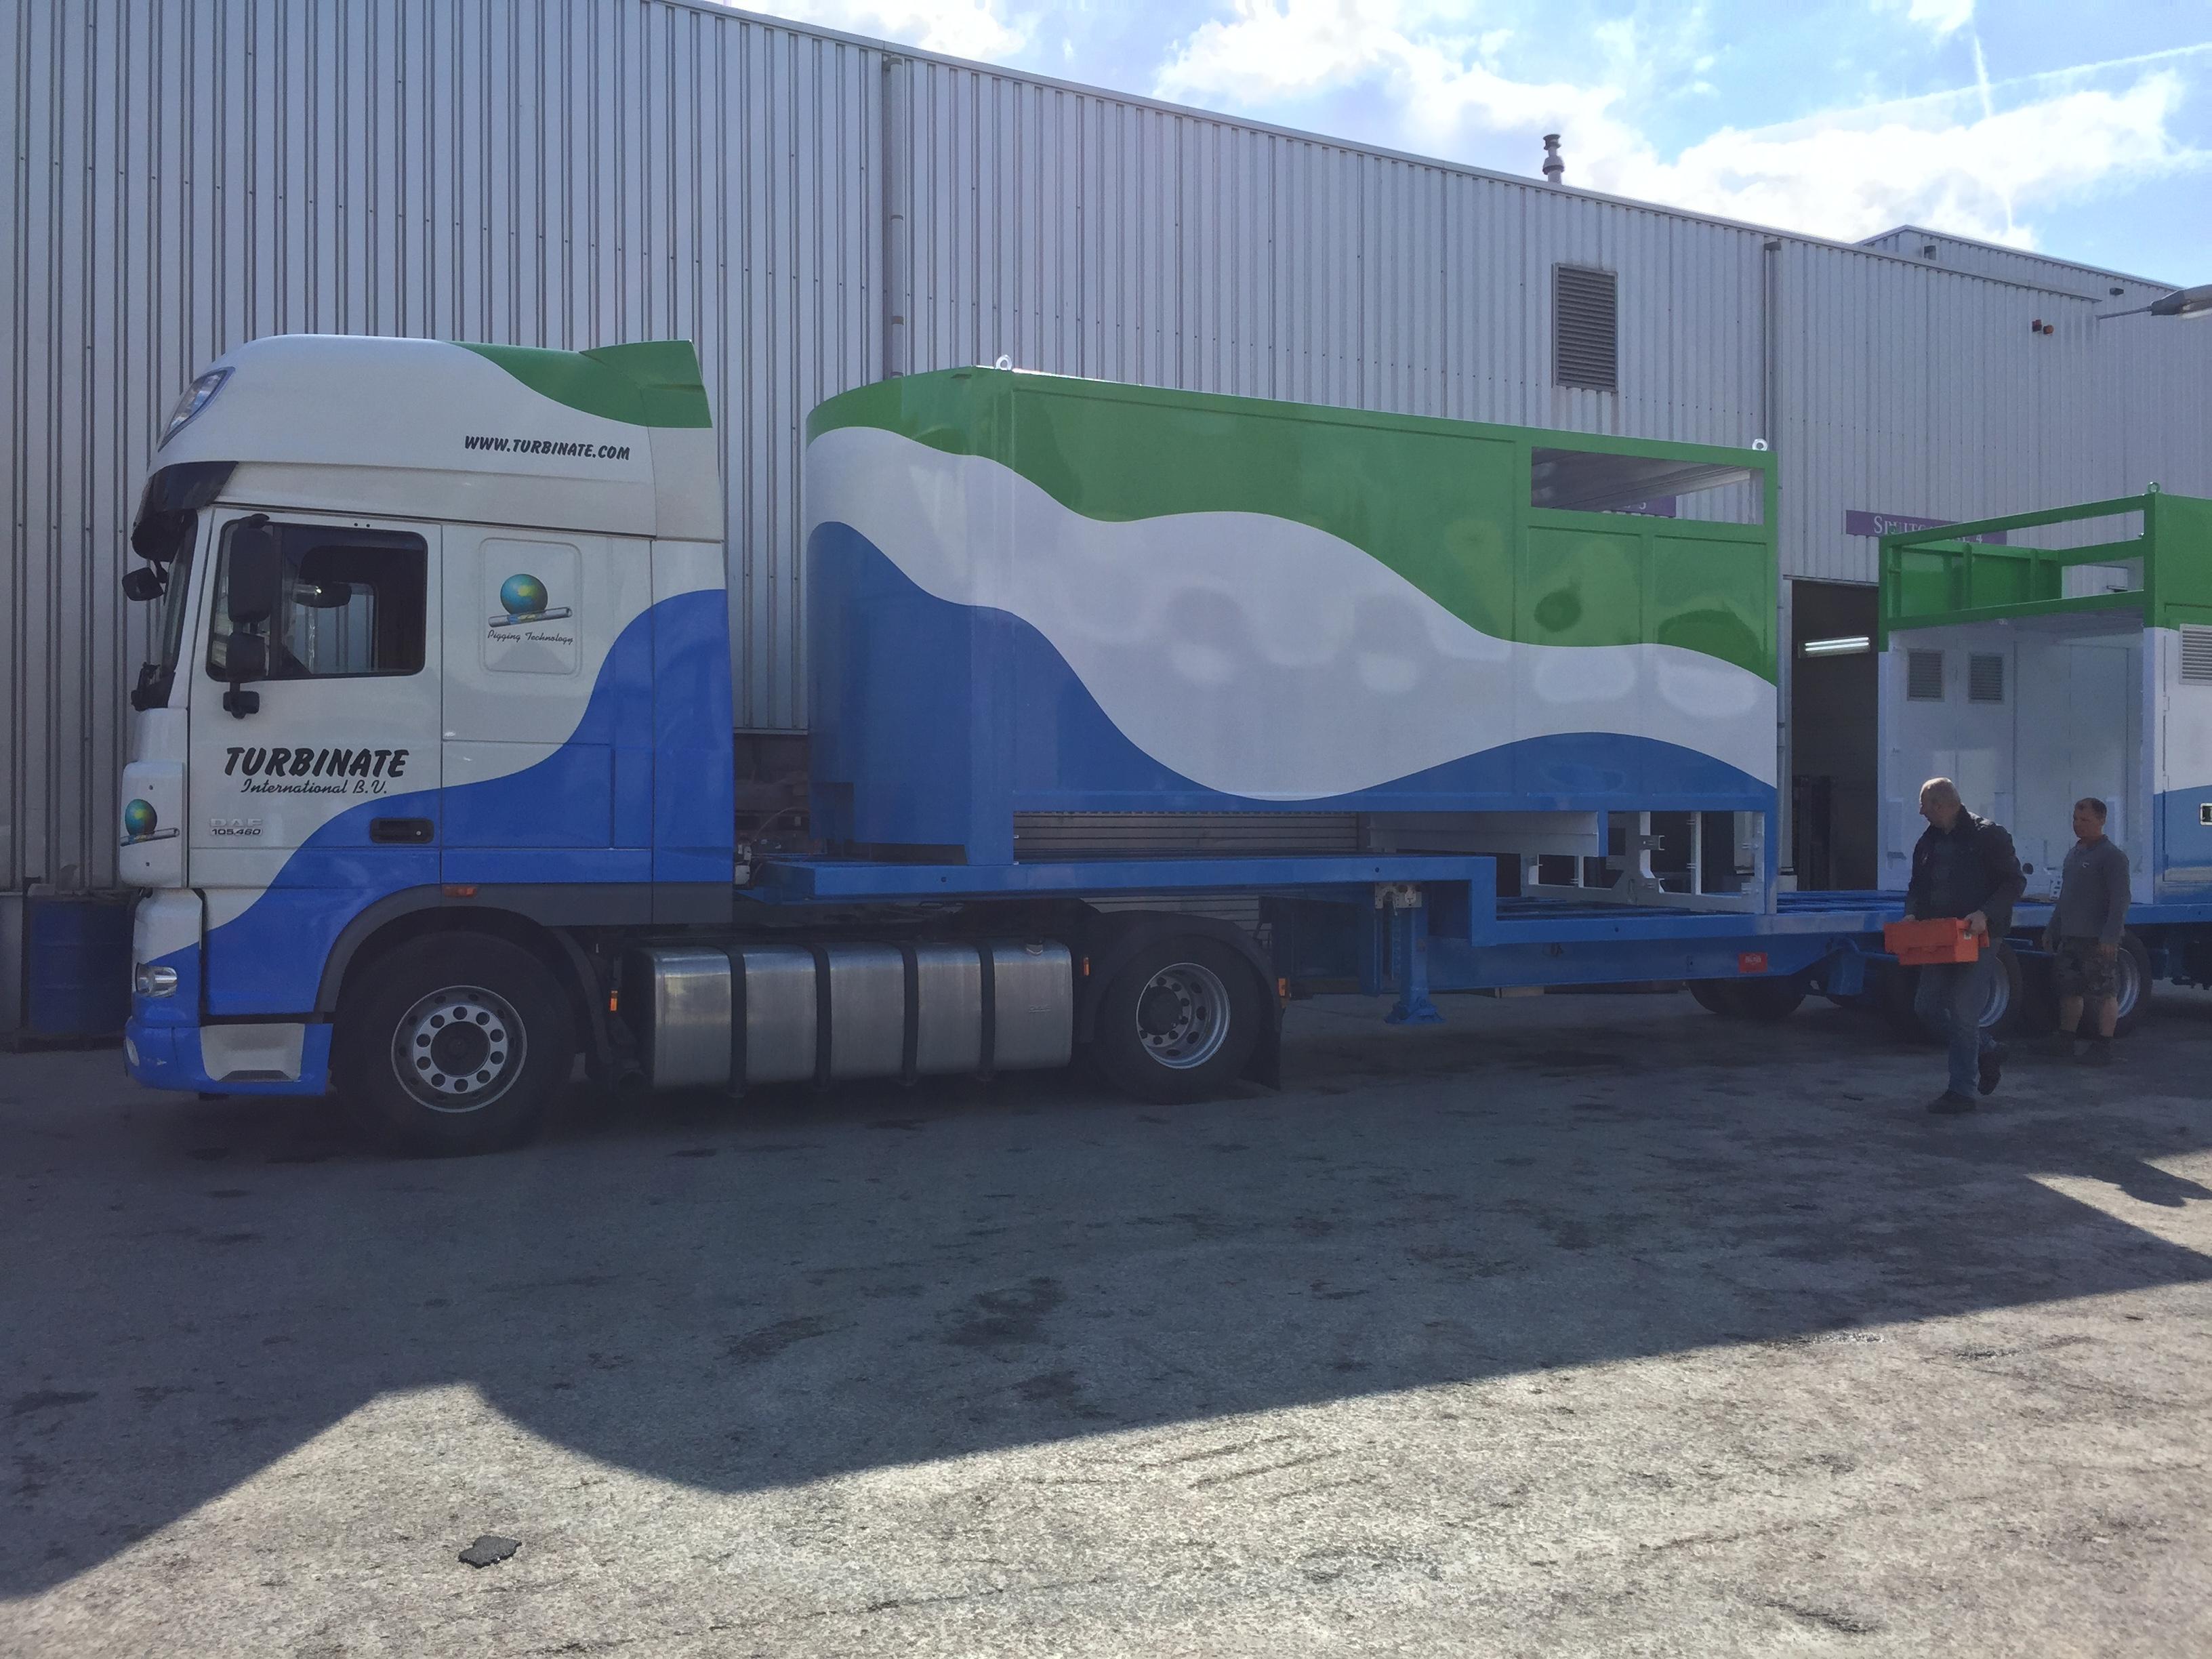 Nieuwe Mobiele Pigging unit voor Turbinate International